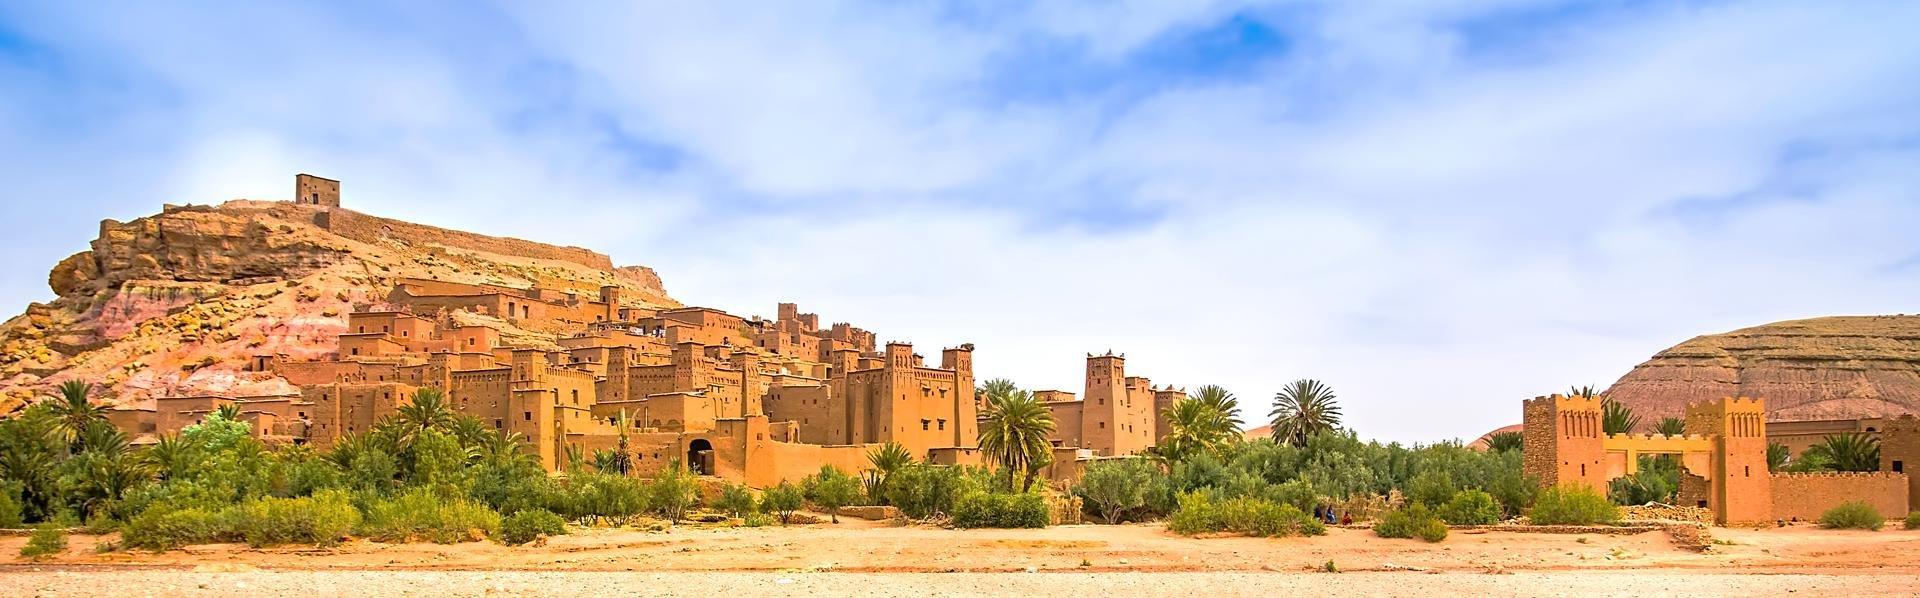 Kasbah Ait-ben-Haddou in Marokko